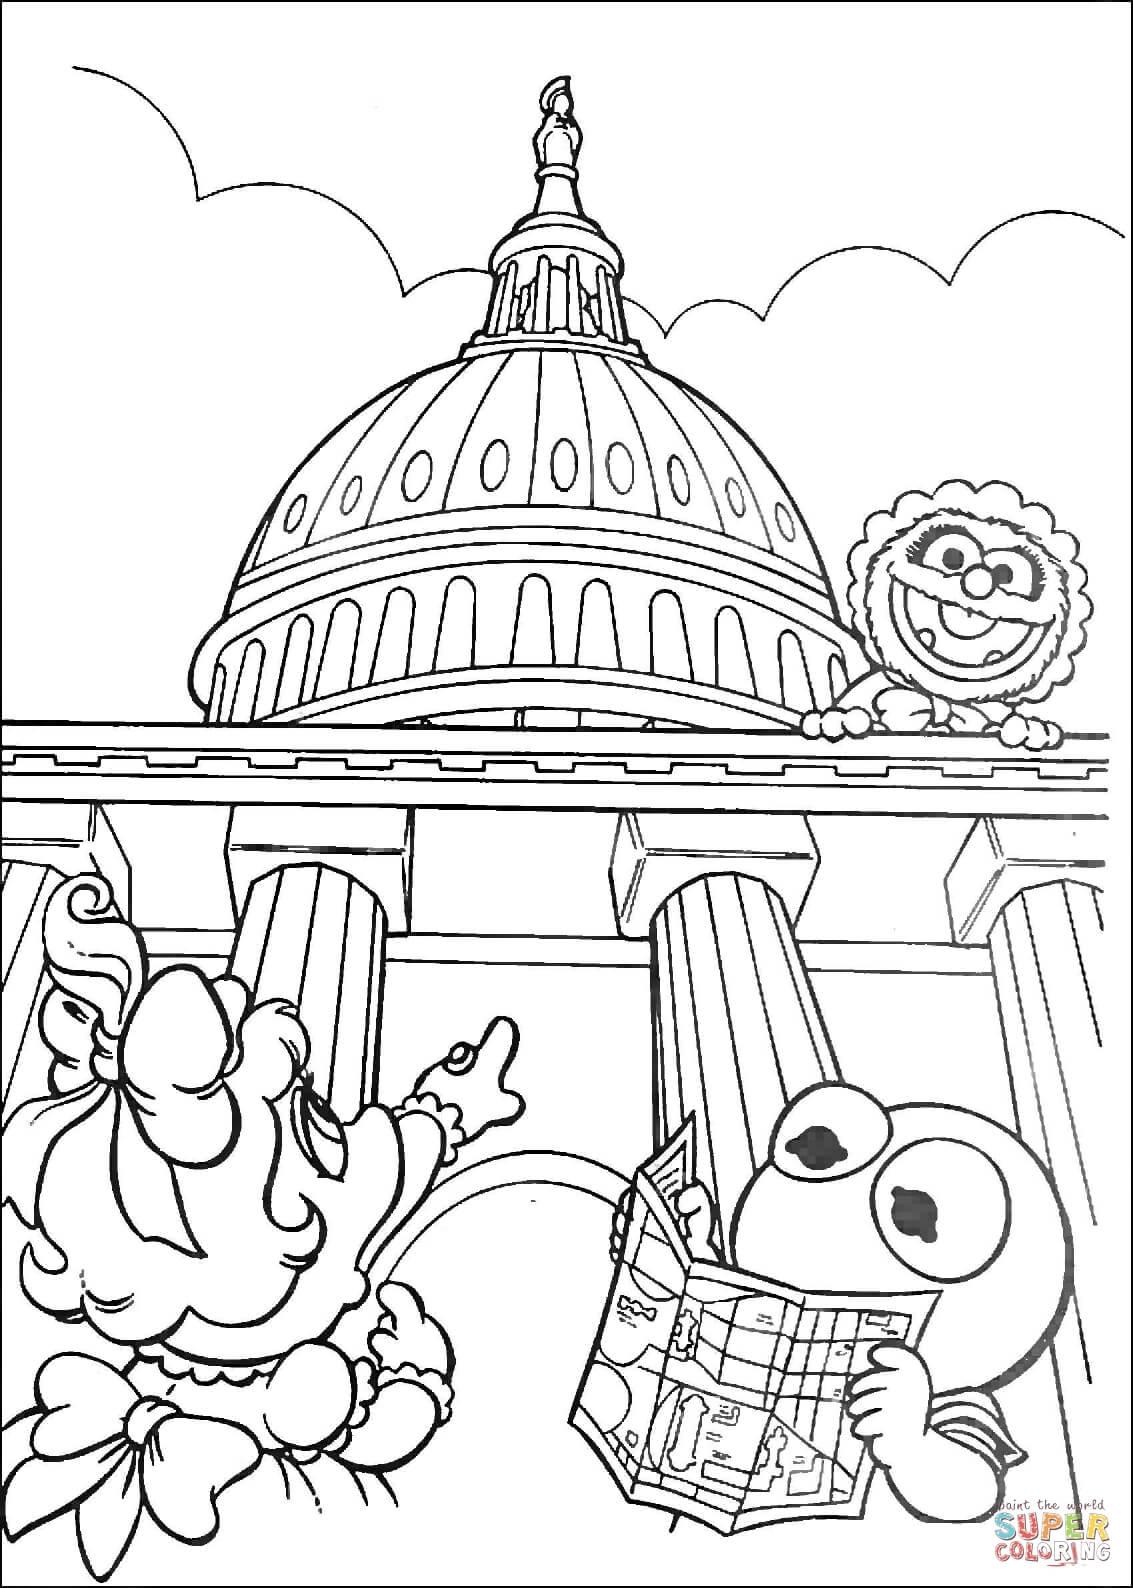 Washington Dc Coloring Pages : washington, coloring, pages, Muppet, Babies, Washington, Coloring, Printable